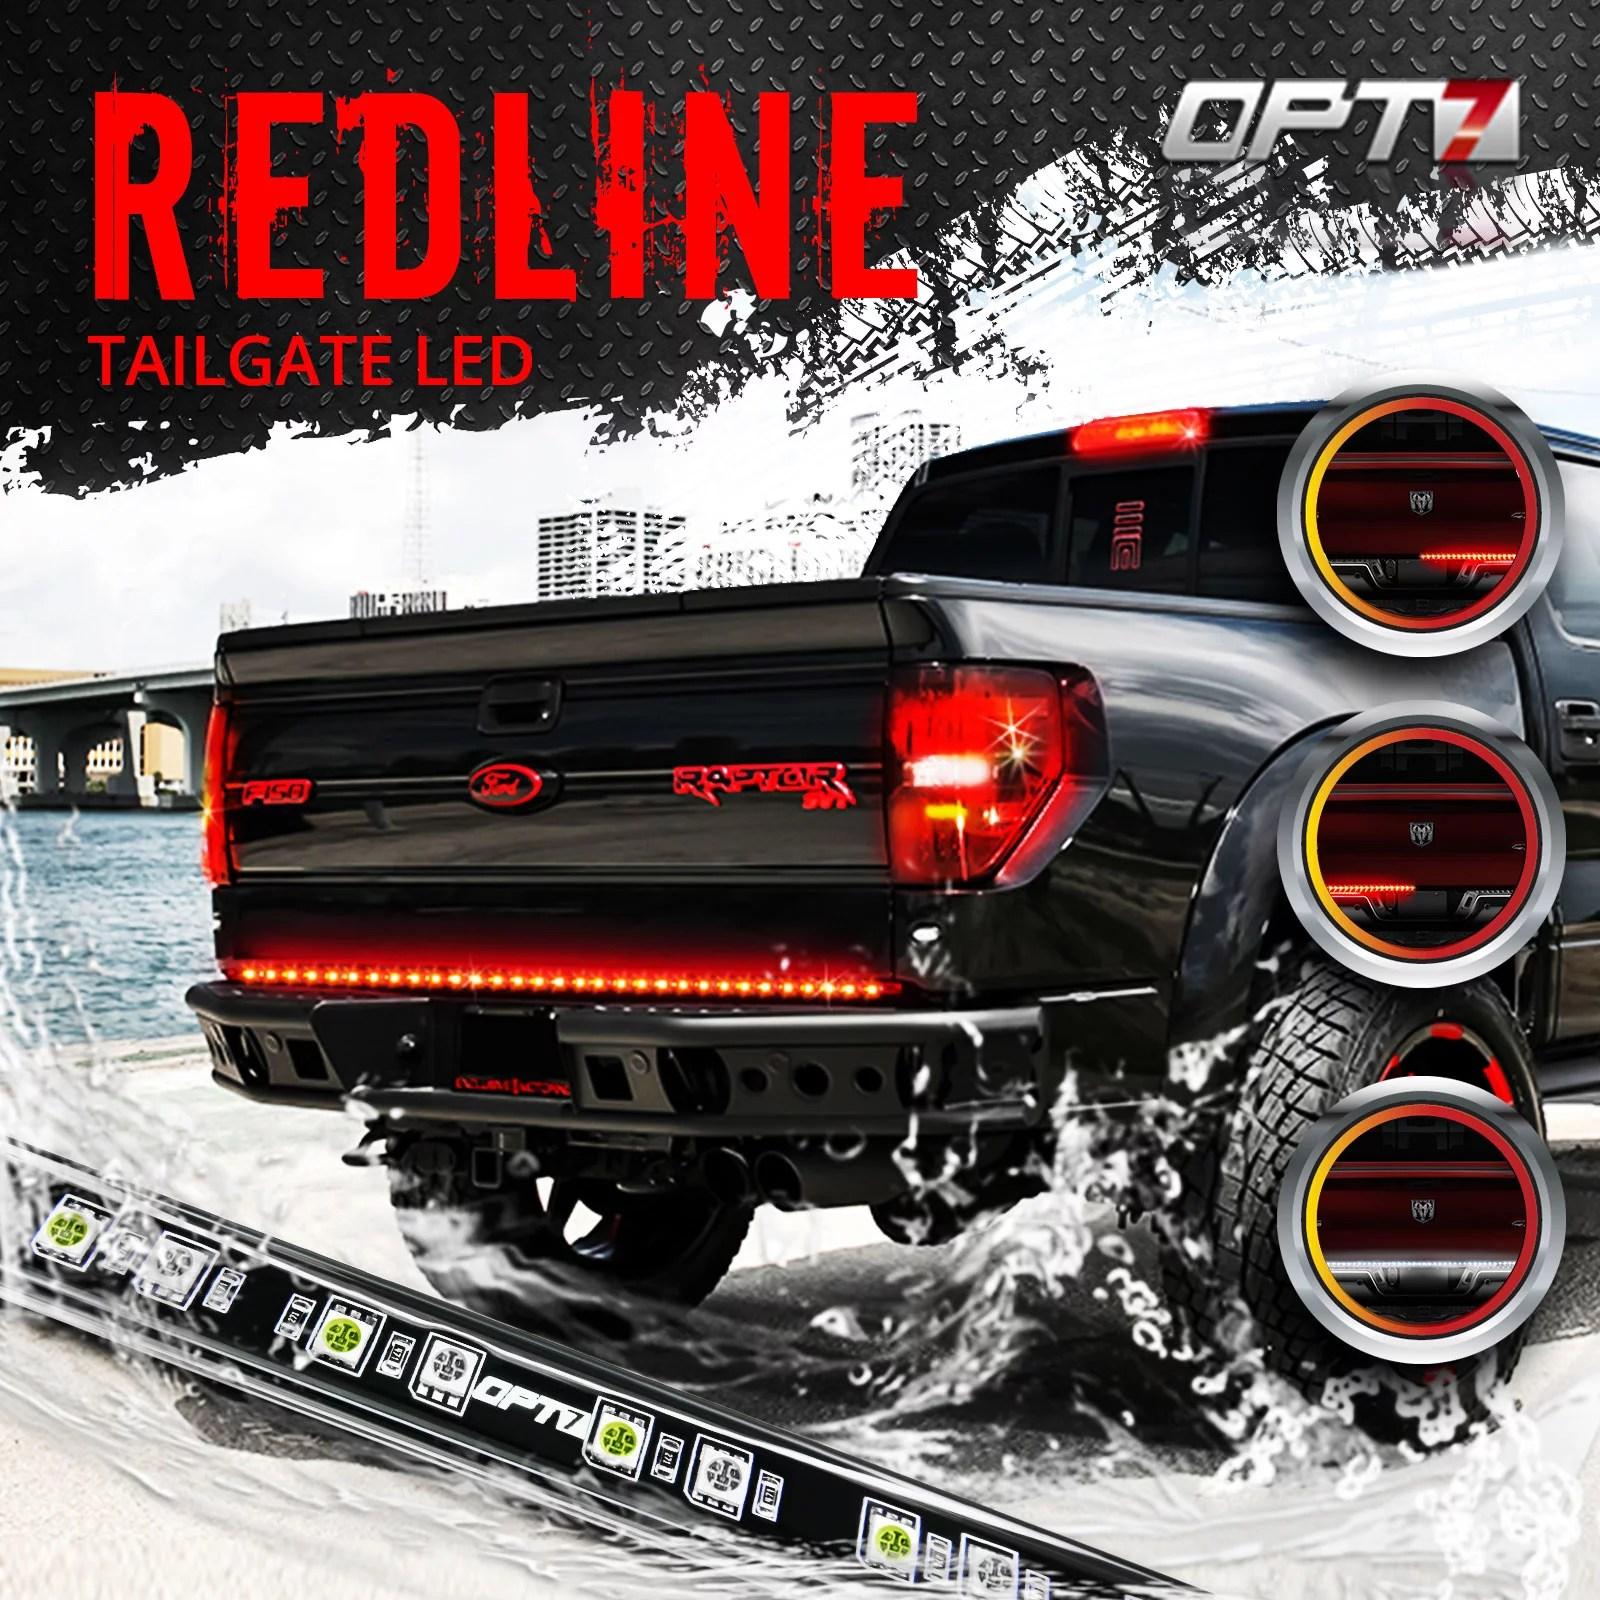 medium resolution of 60 redline led tailgate light bar tri core led weatherproof led light circuit diagram opt 7 led light bar wiring diagram for truck